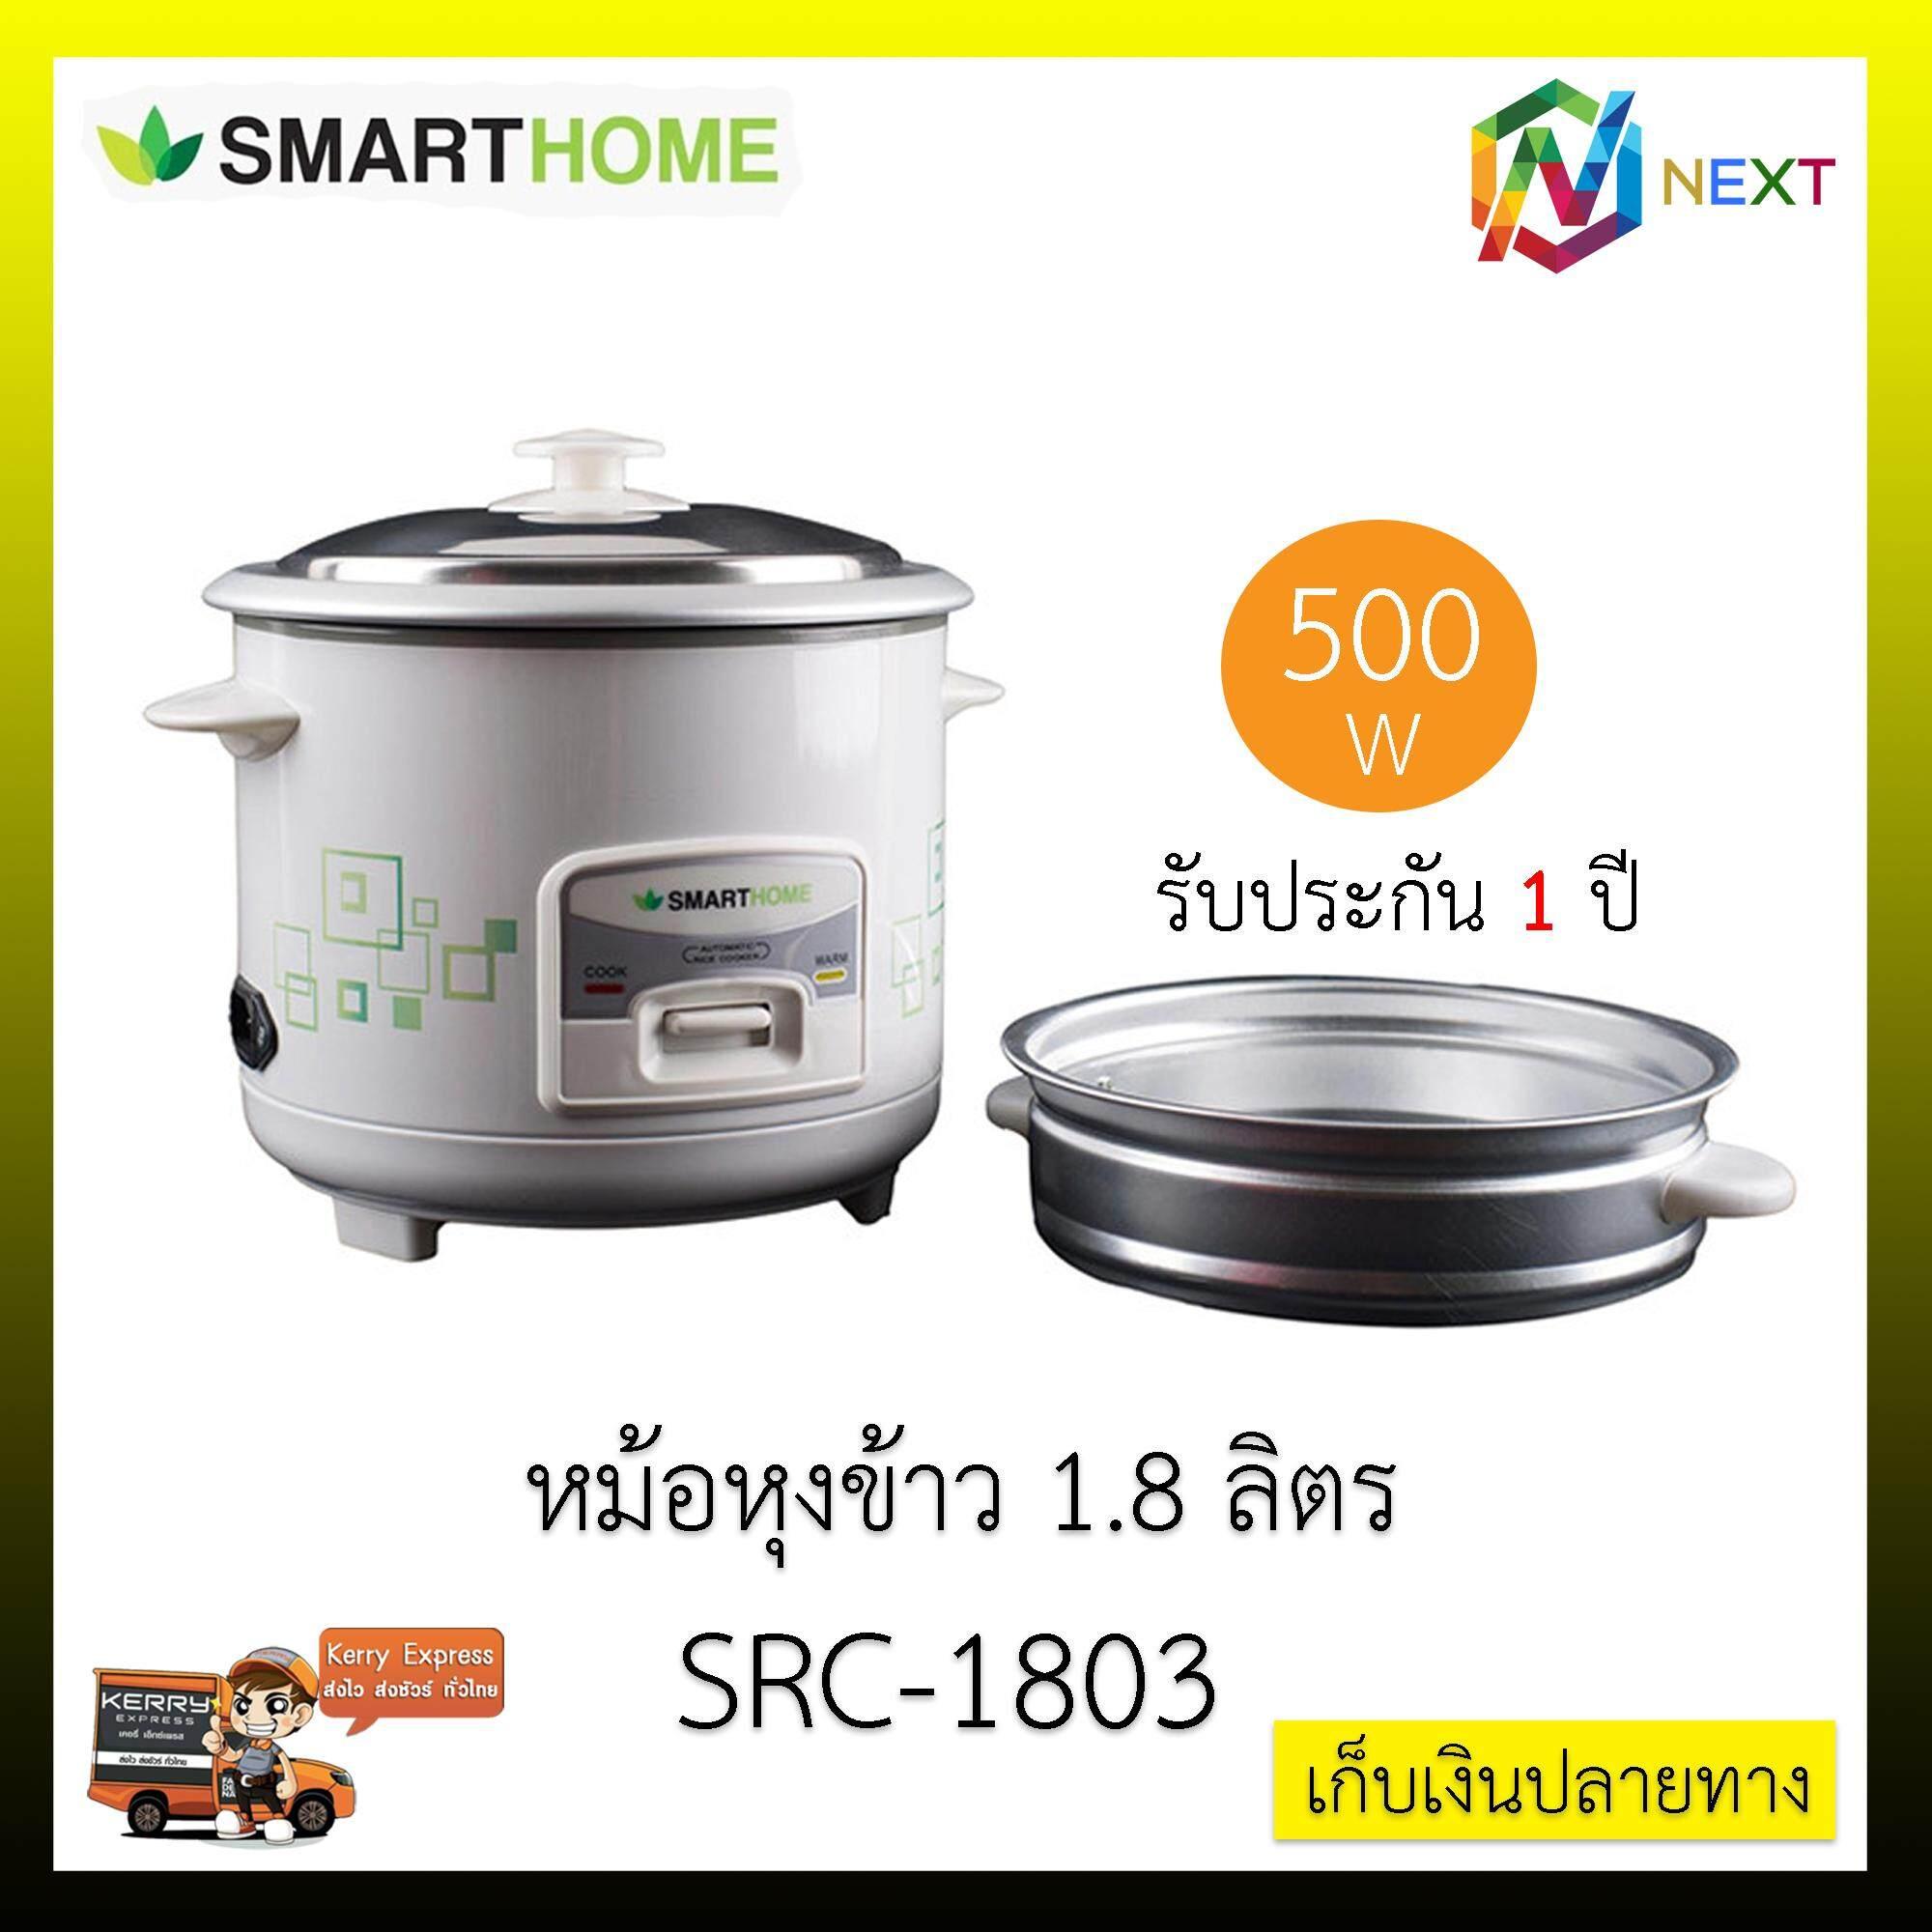 SMART HOME RICE COOKER หม้อหุงข้าว 1.8 ลิตร รุ่น SRC-1803